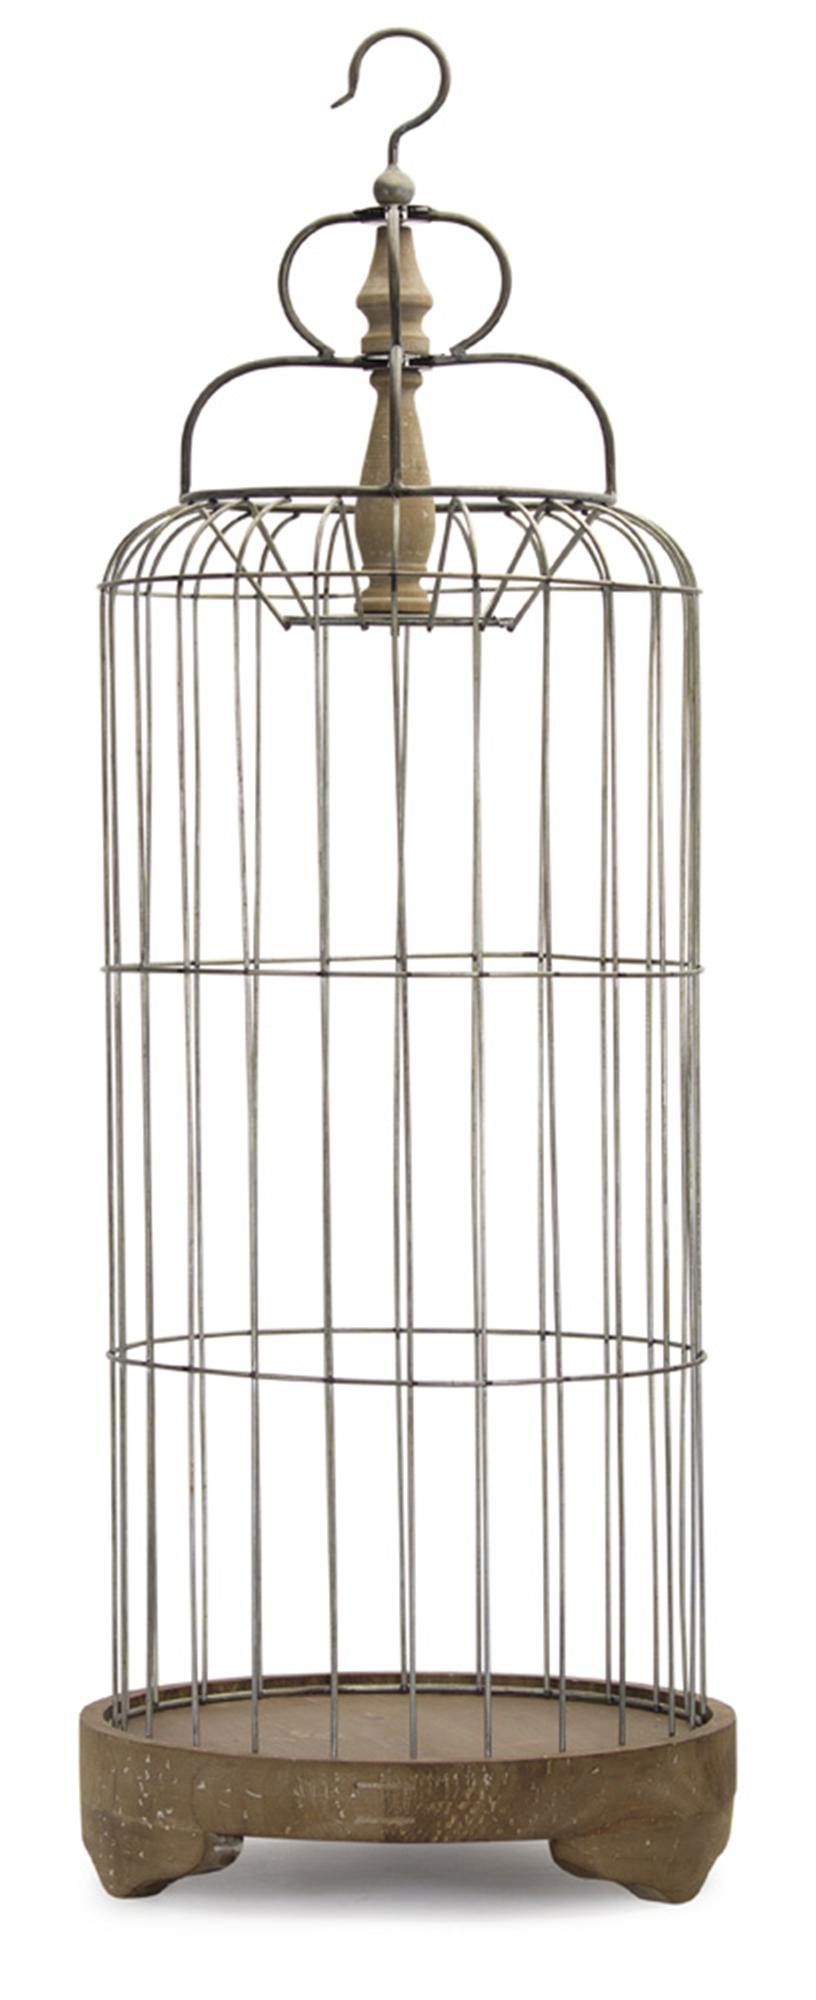 "Bird Cage 41""H Iron/Wood"